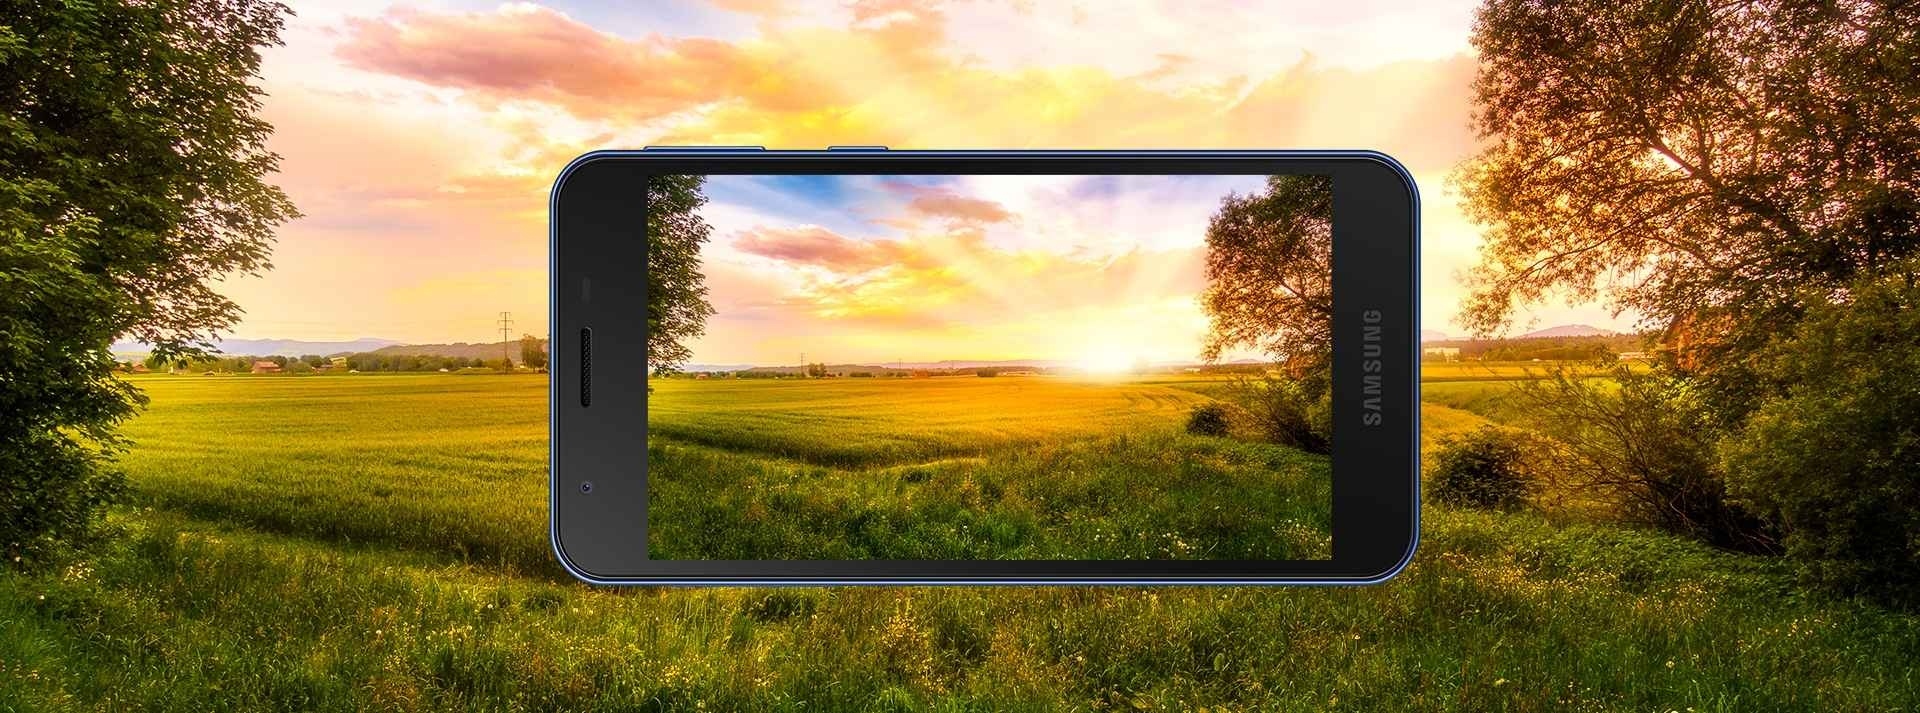 Samsung Galaxy A2 Core 5 inch qHD TFT Display